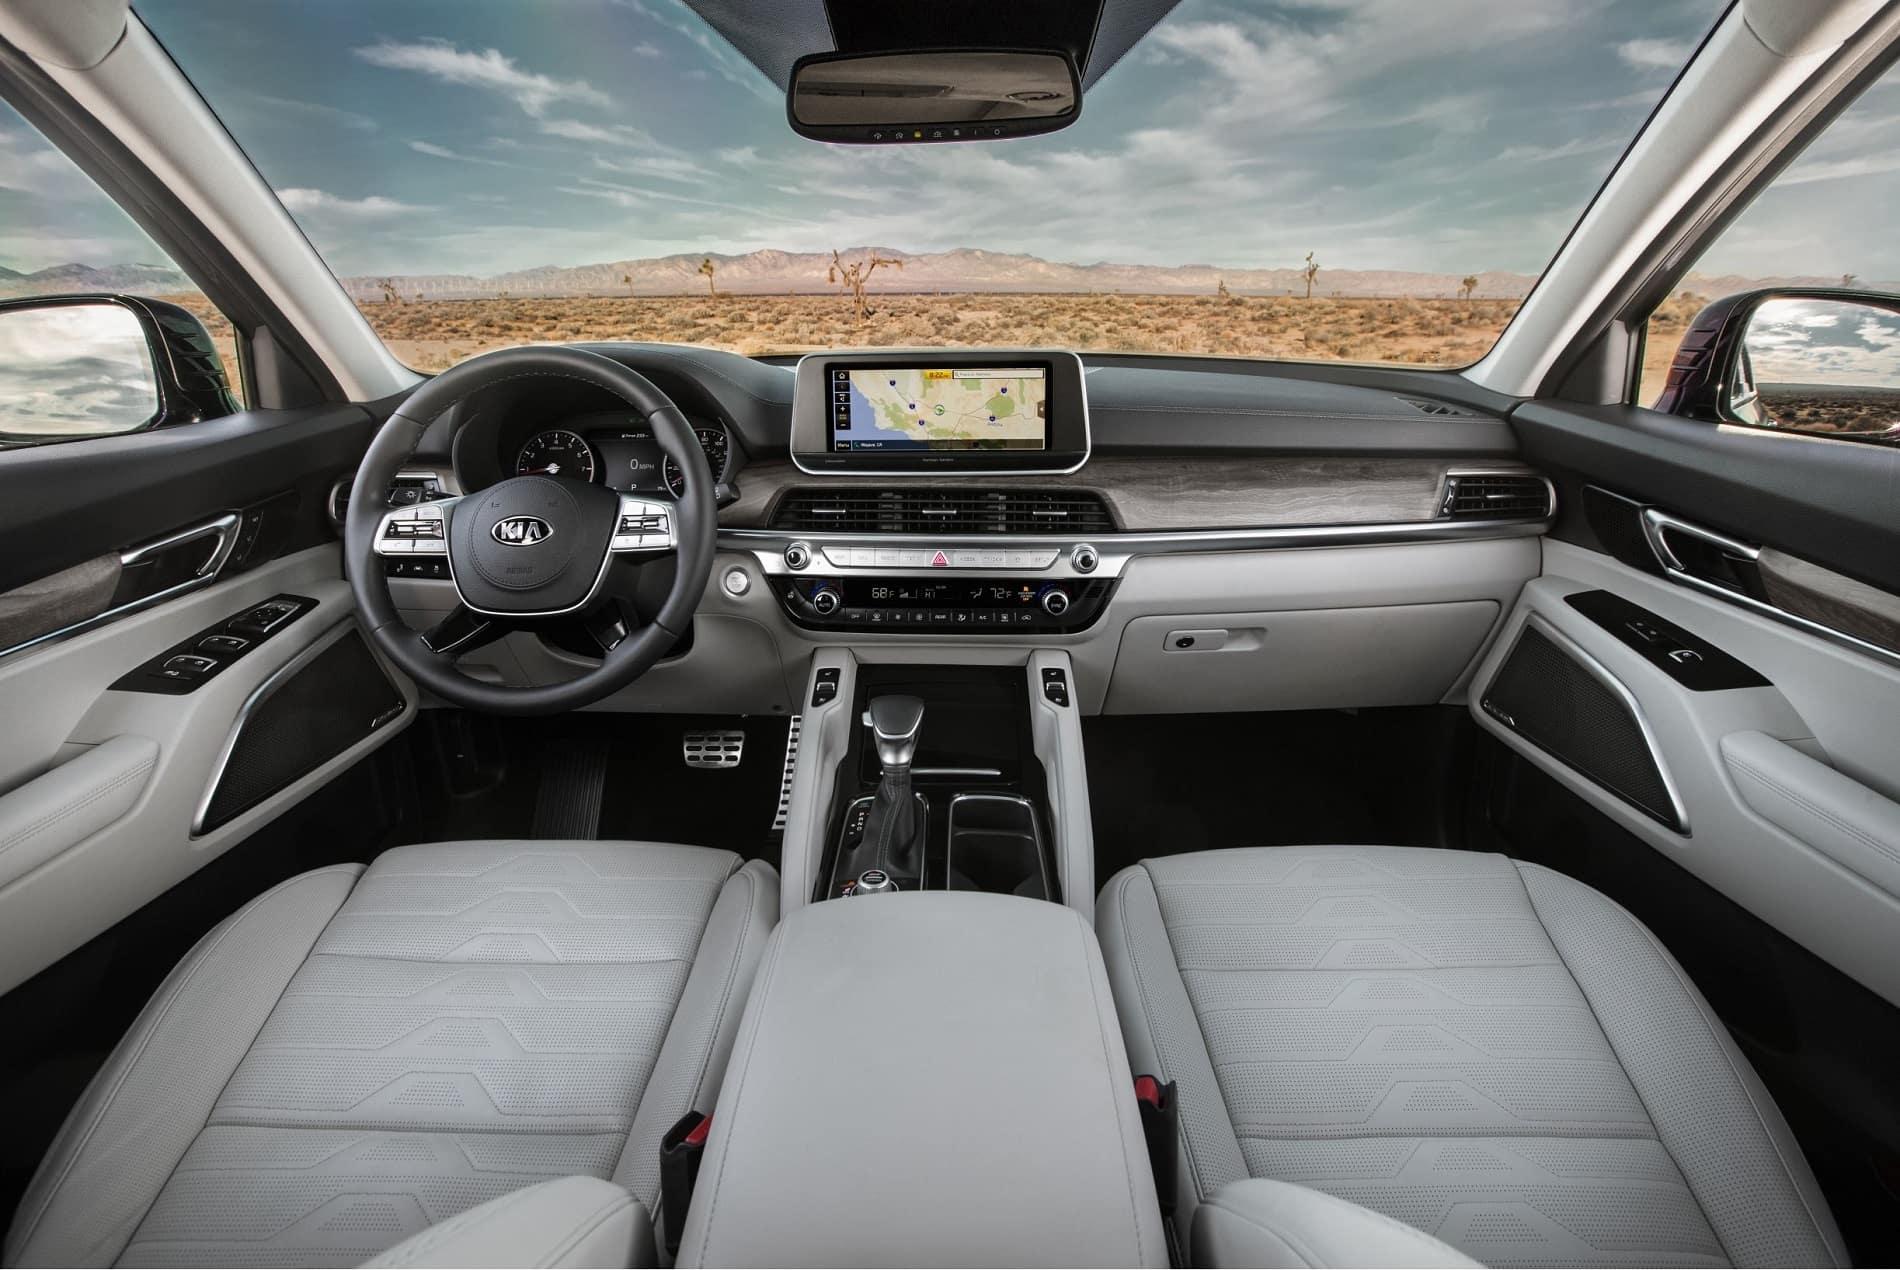 2020 Kia Telluride Leather, Dash and Technology Interior Mid Size Luxury SUV at Kia of Valencia near Santa Clarita, CA and Los Angeles Metro